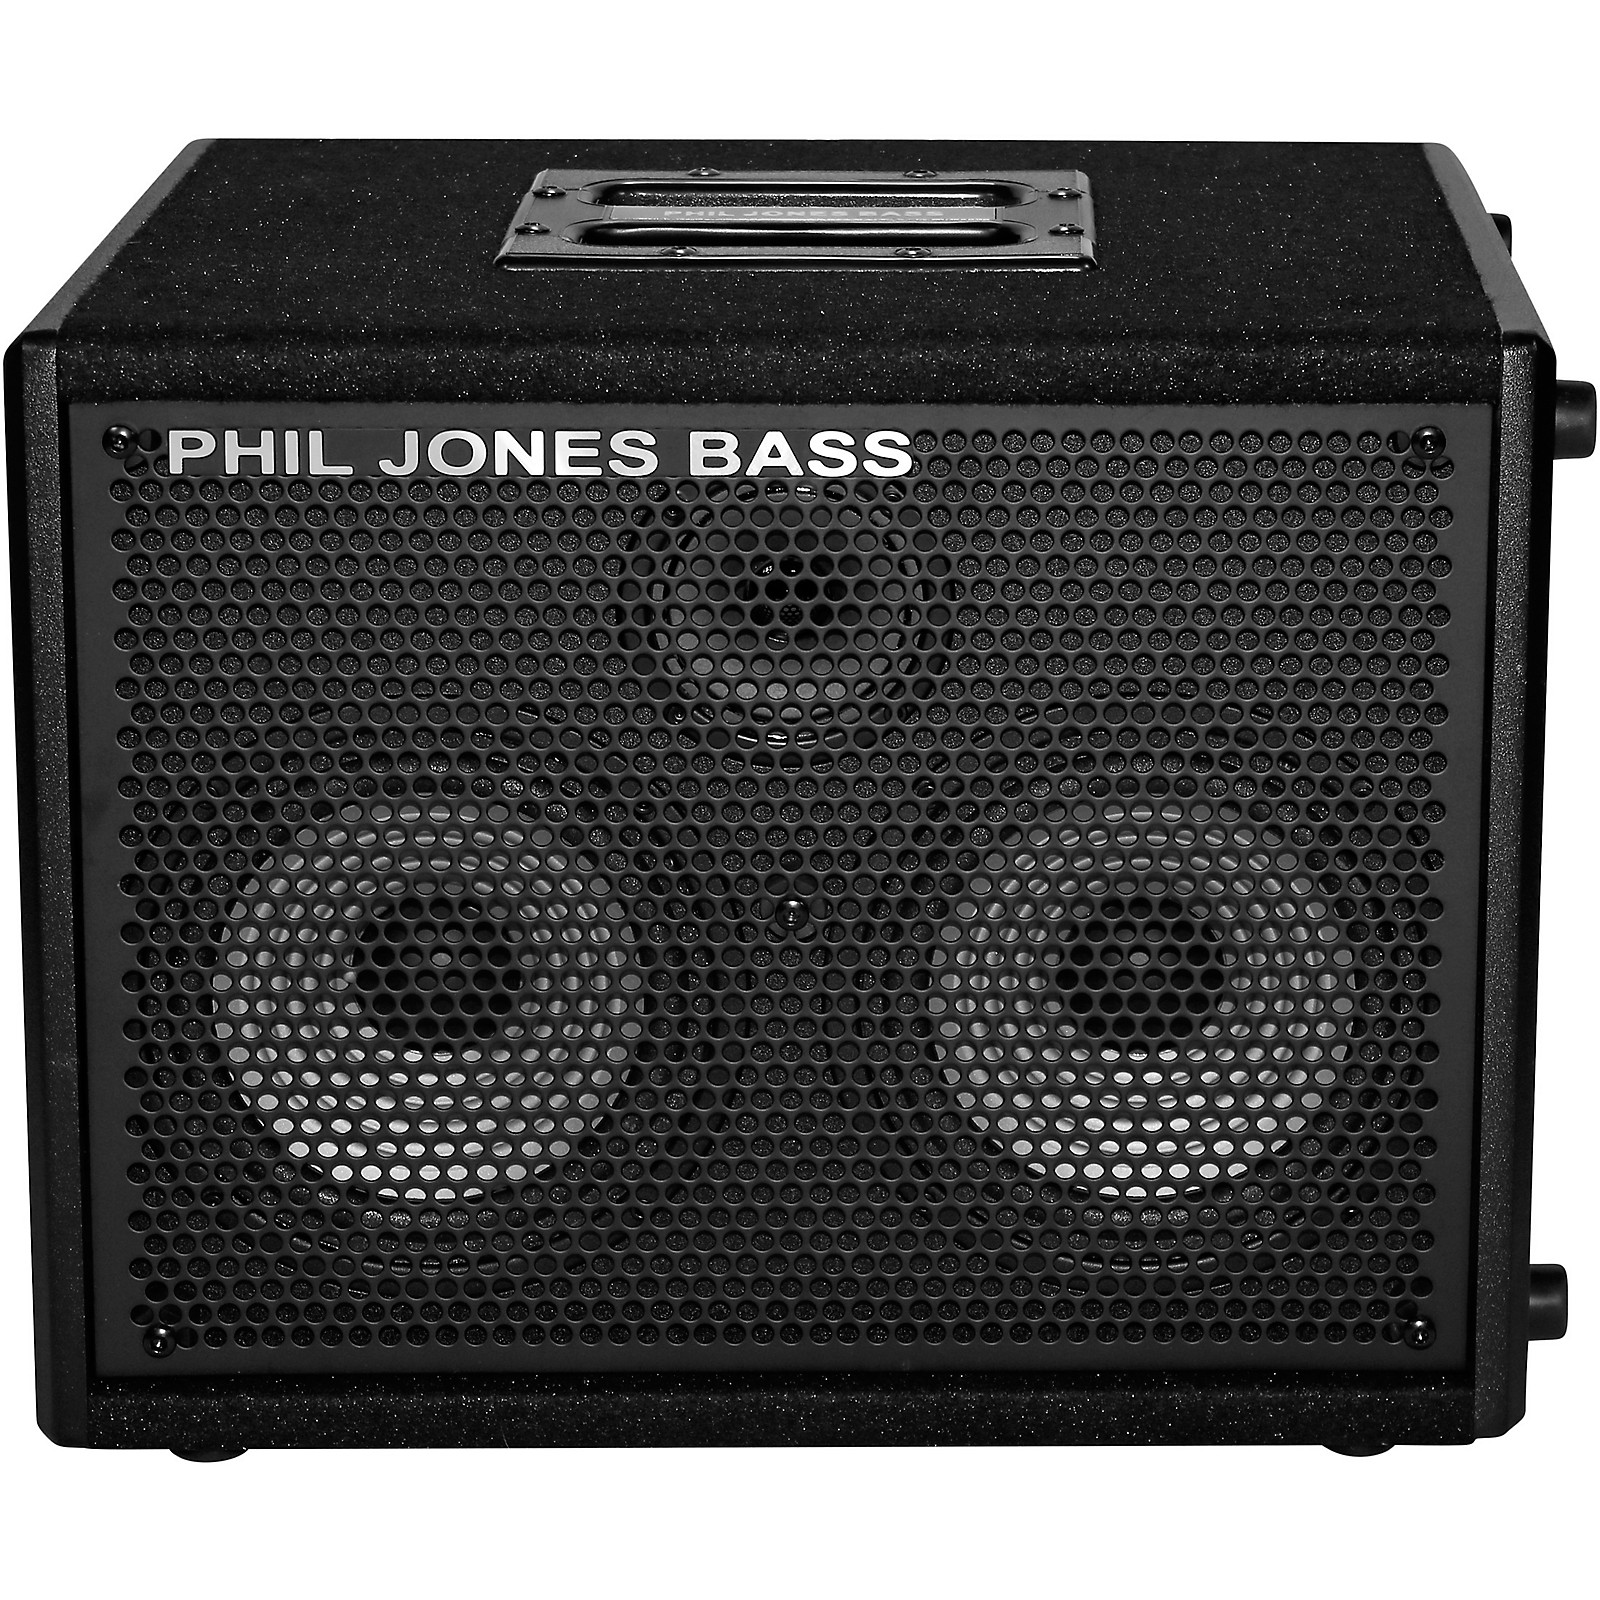 Phil Jones Bass Cab 27 200W 2x7 Bass Speaker Cab